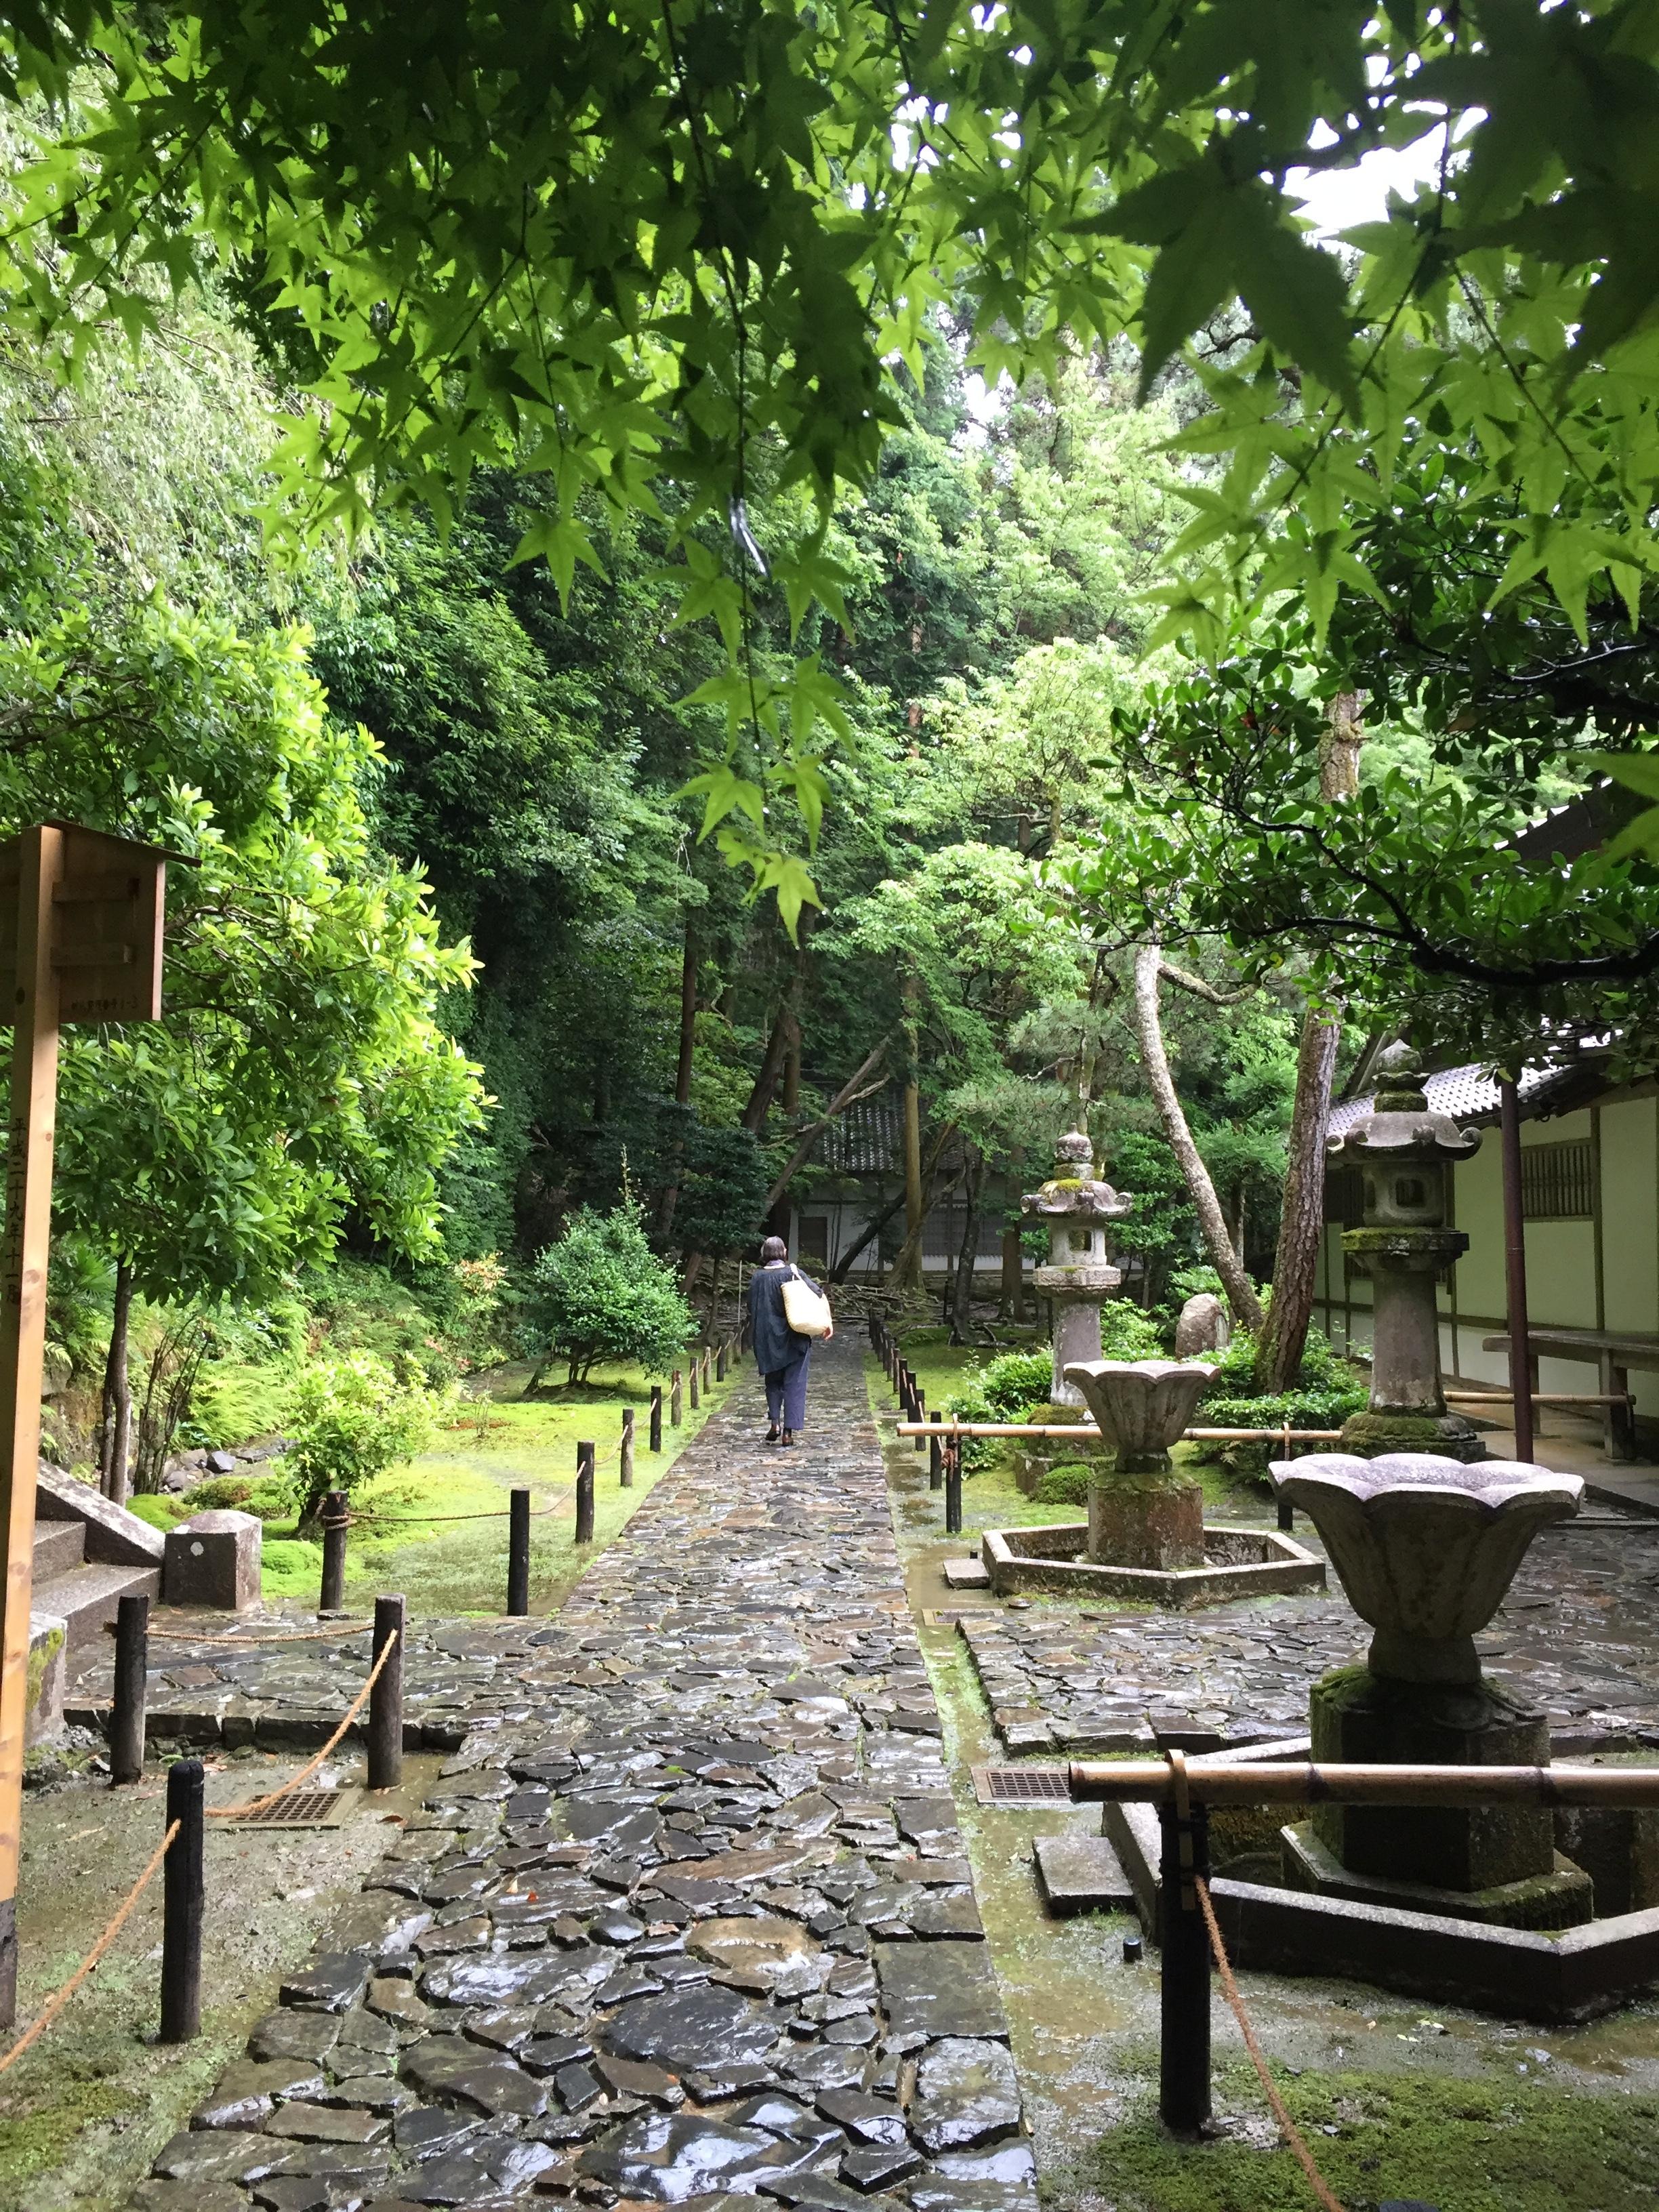 Daniela walking in the rain at Honen-in, Kyoto.